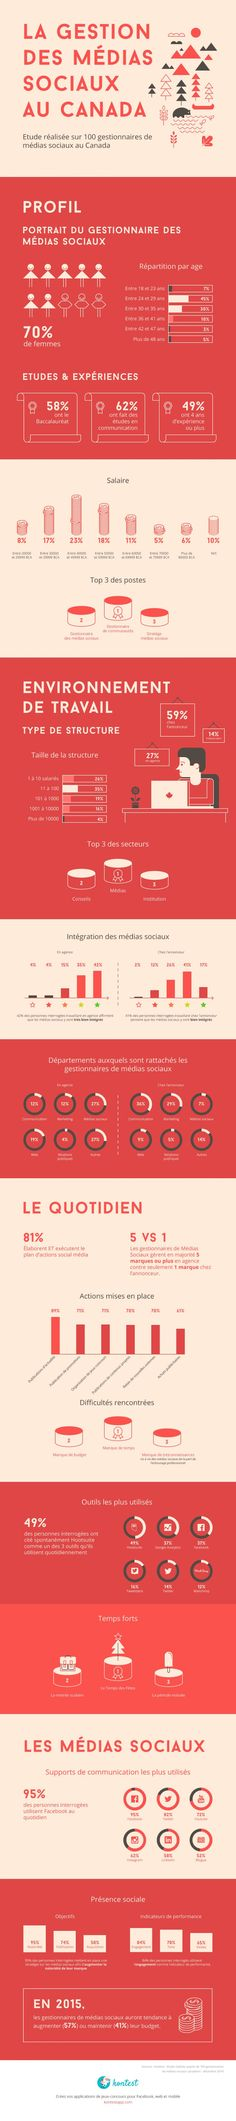 Infographie Kontest - Etude Gestionnaires Communautes Quebec - Janvier 2015